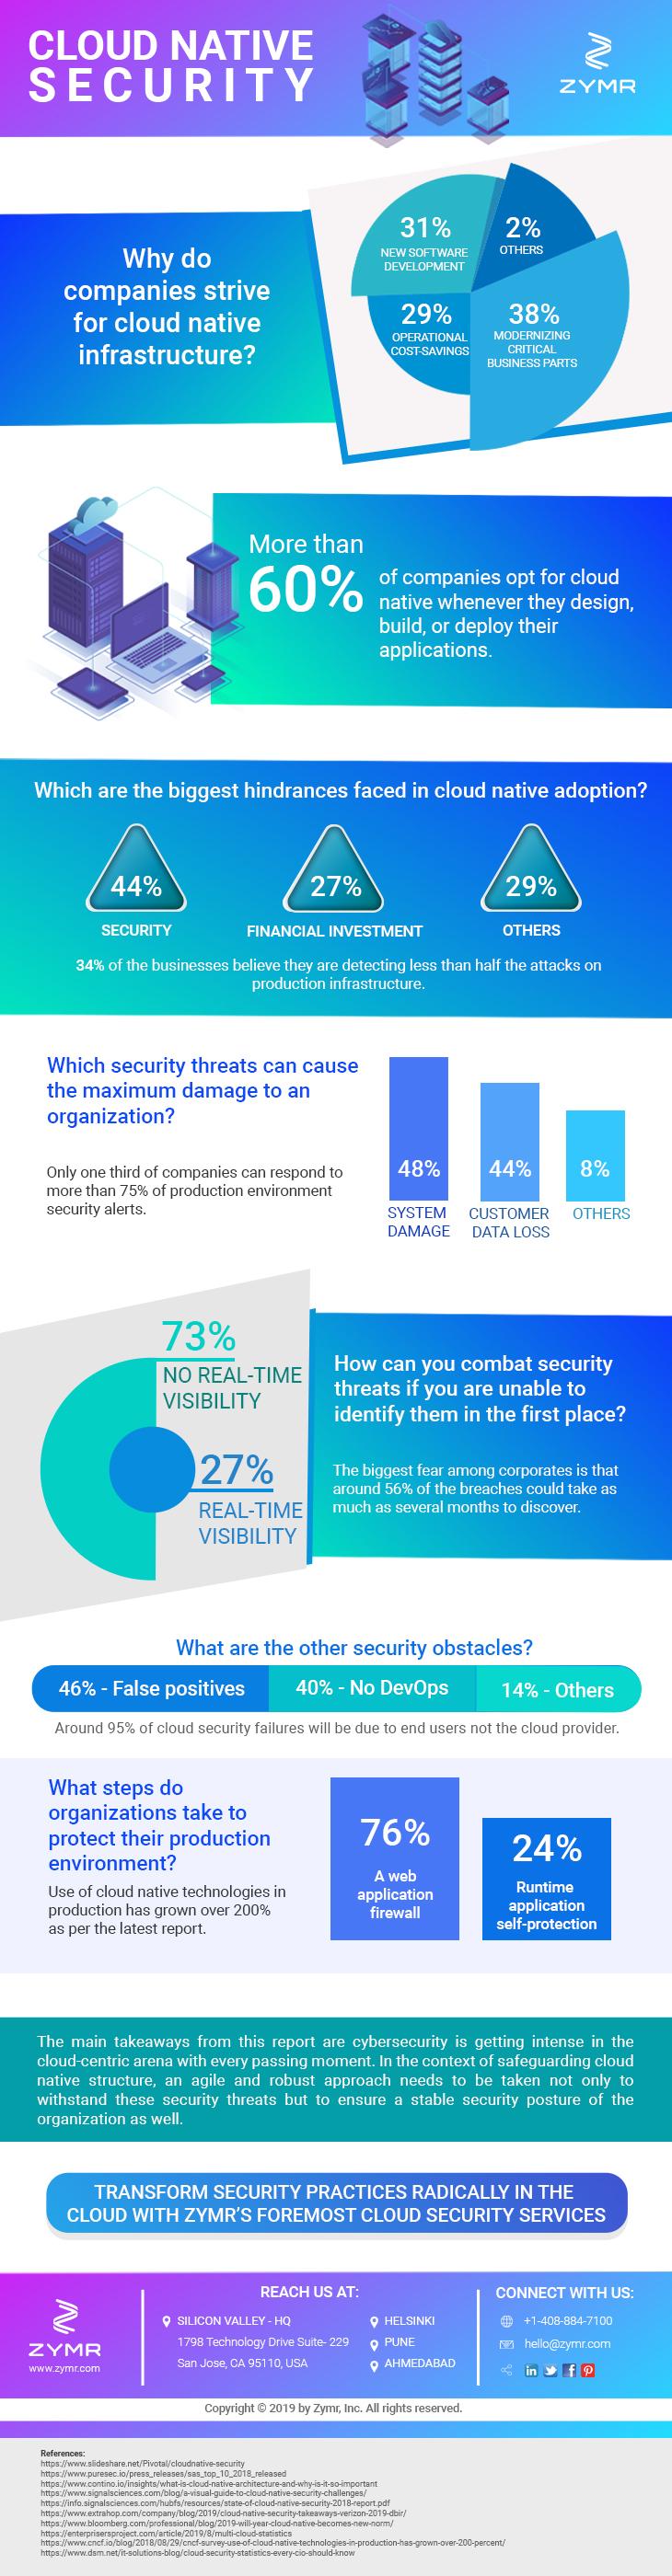 cloud native security services